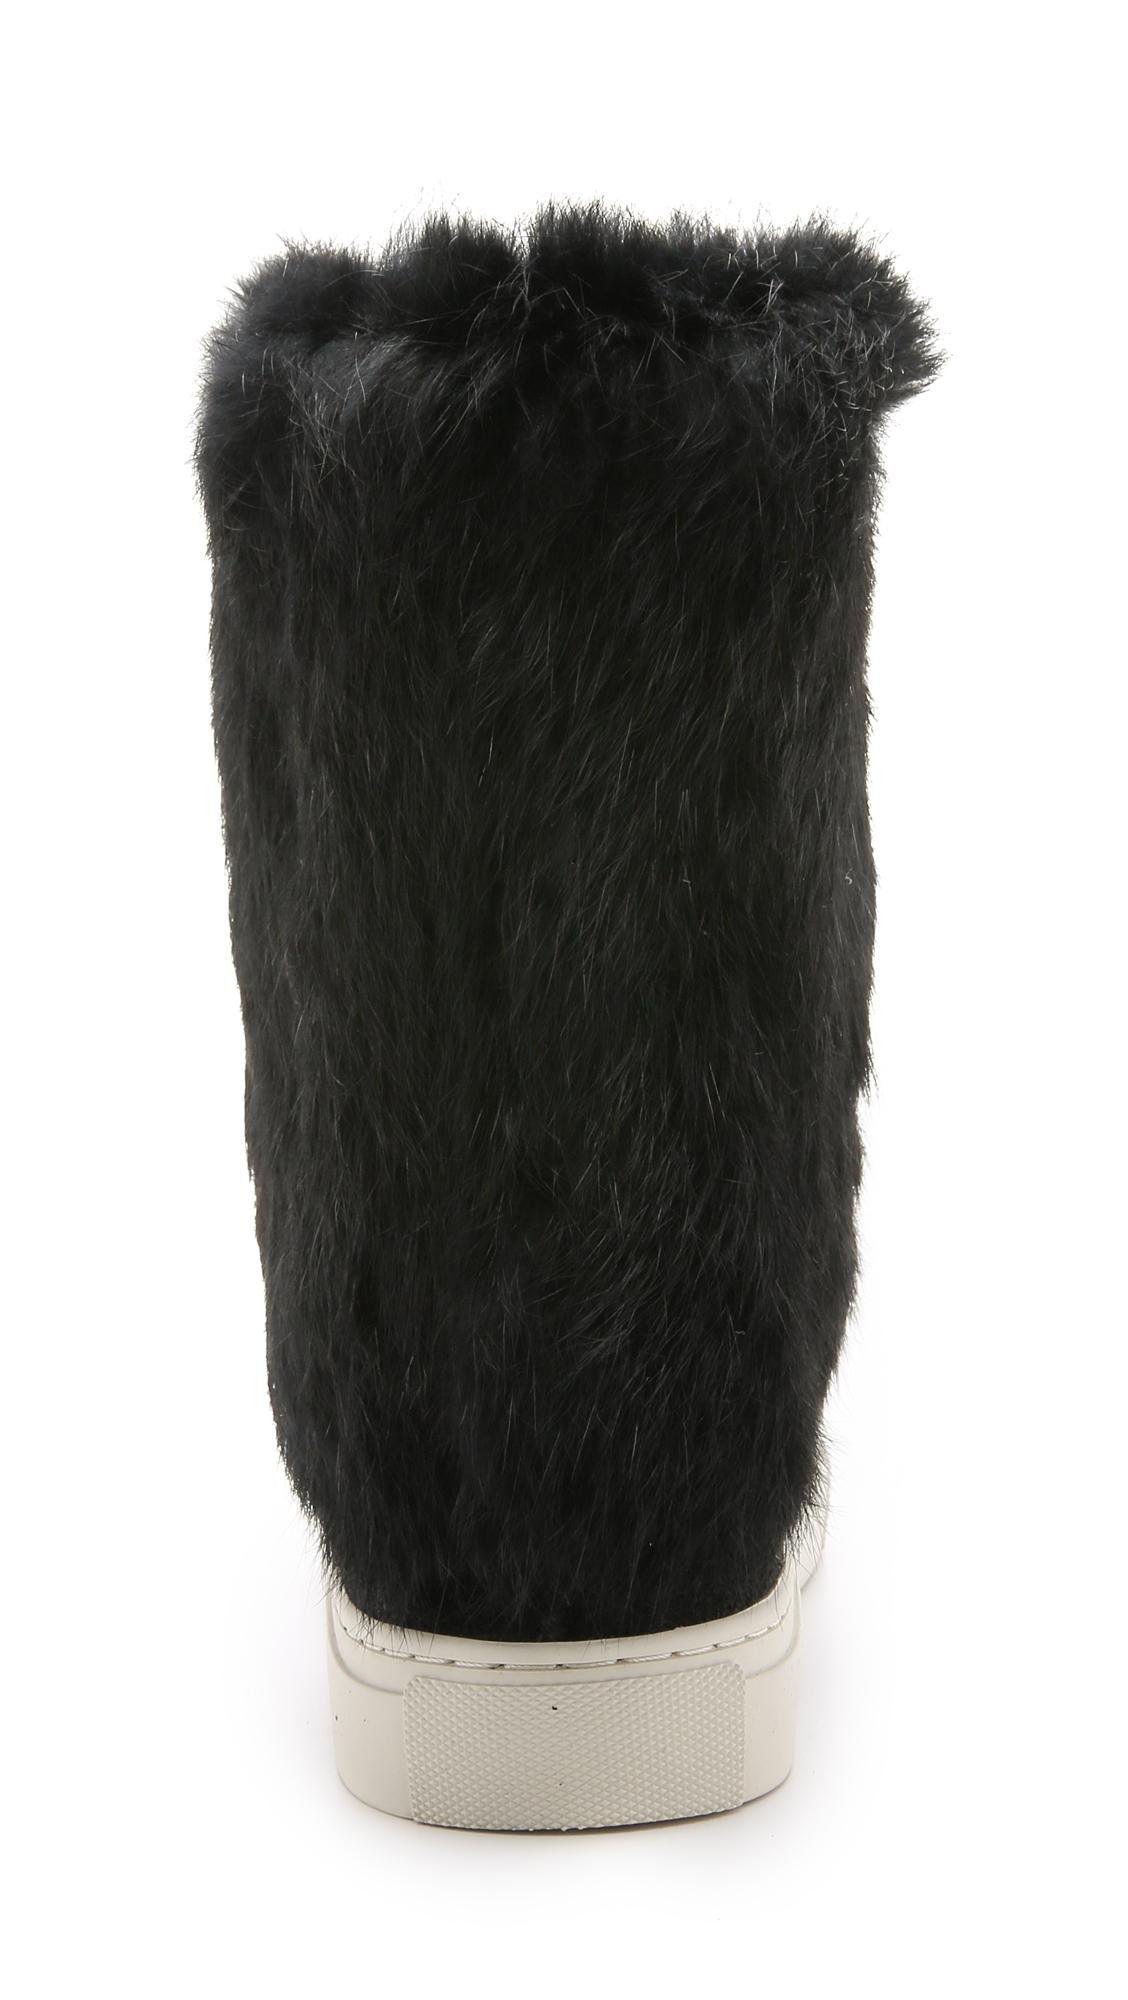 burch anjelica suede fur boots black black in white